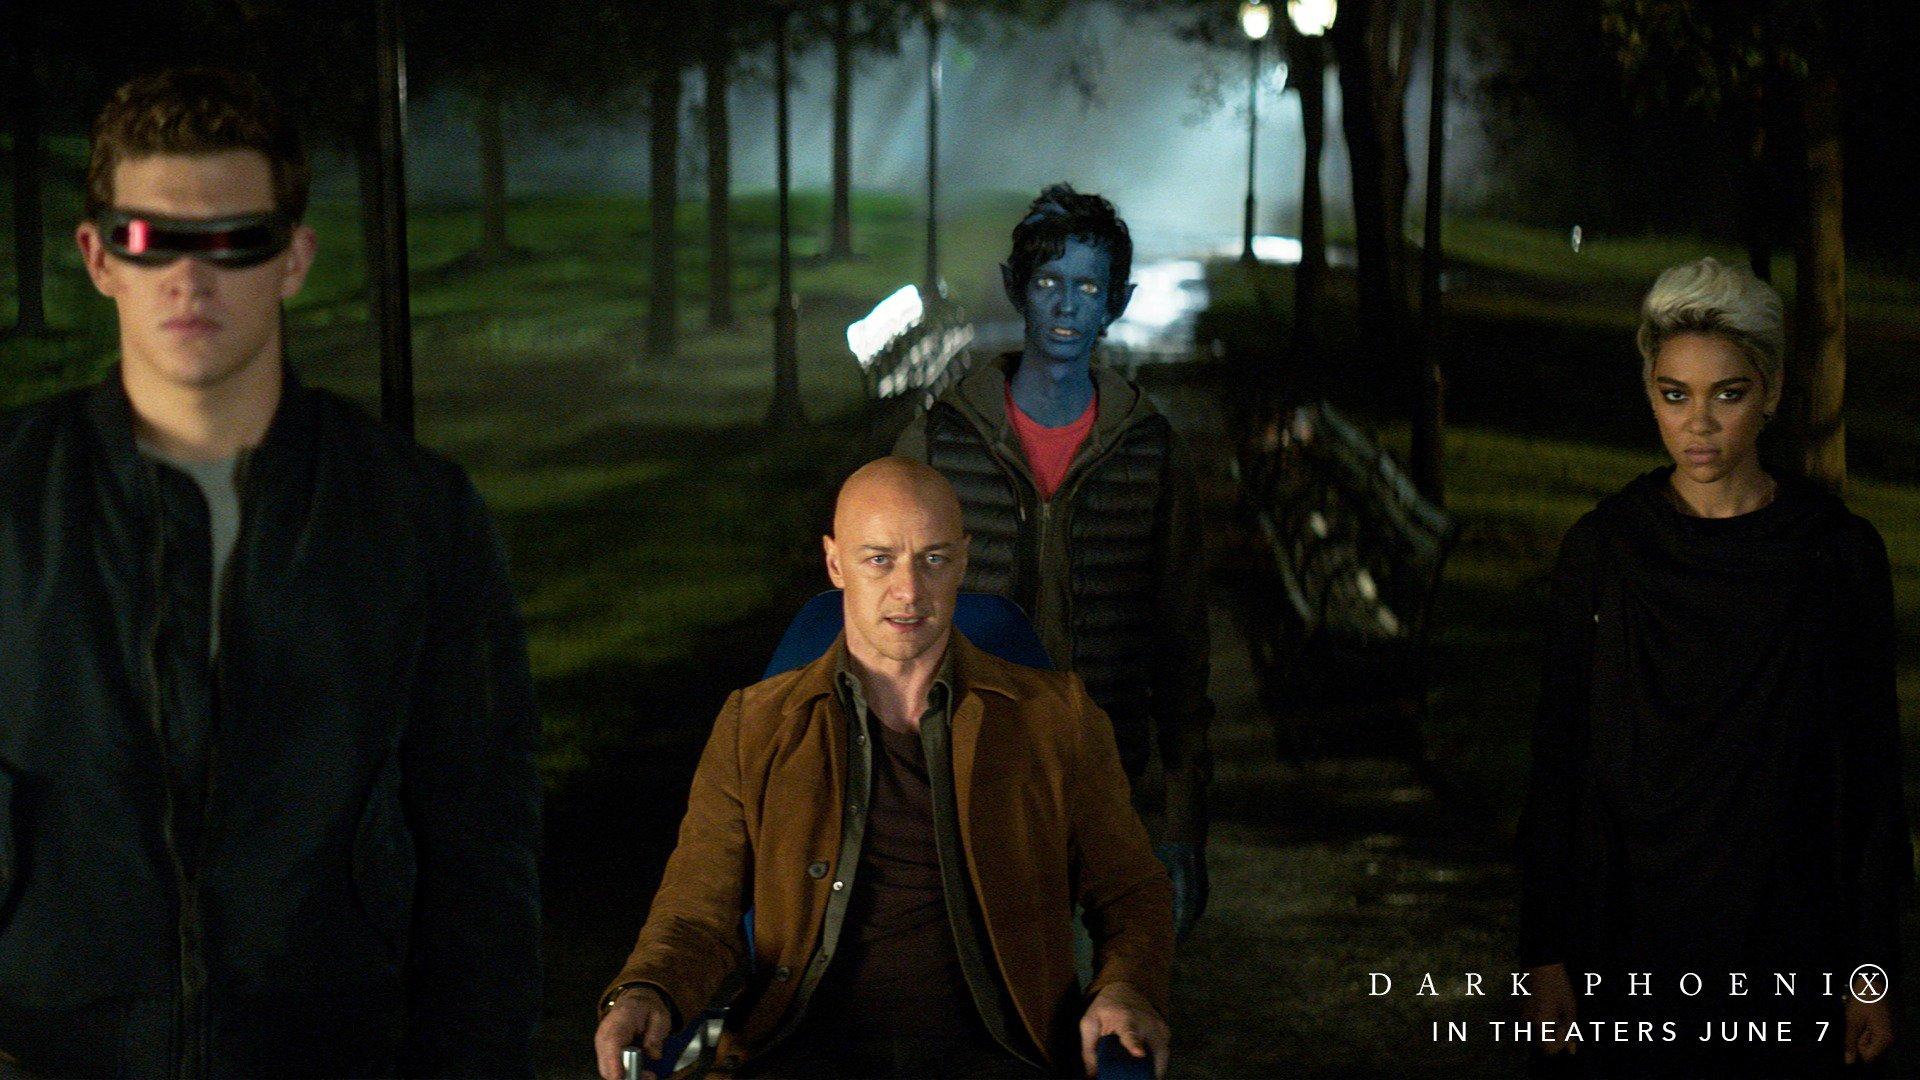 the-x-men-assemble-in-new-photo-from-x-men-dark-phoenix3